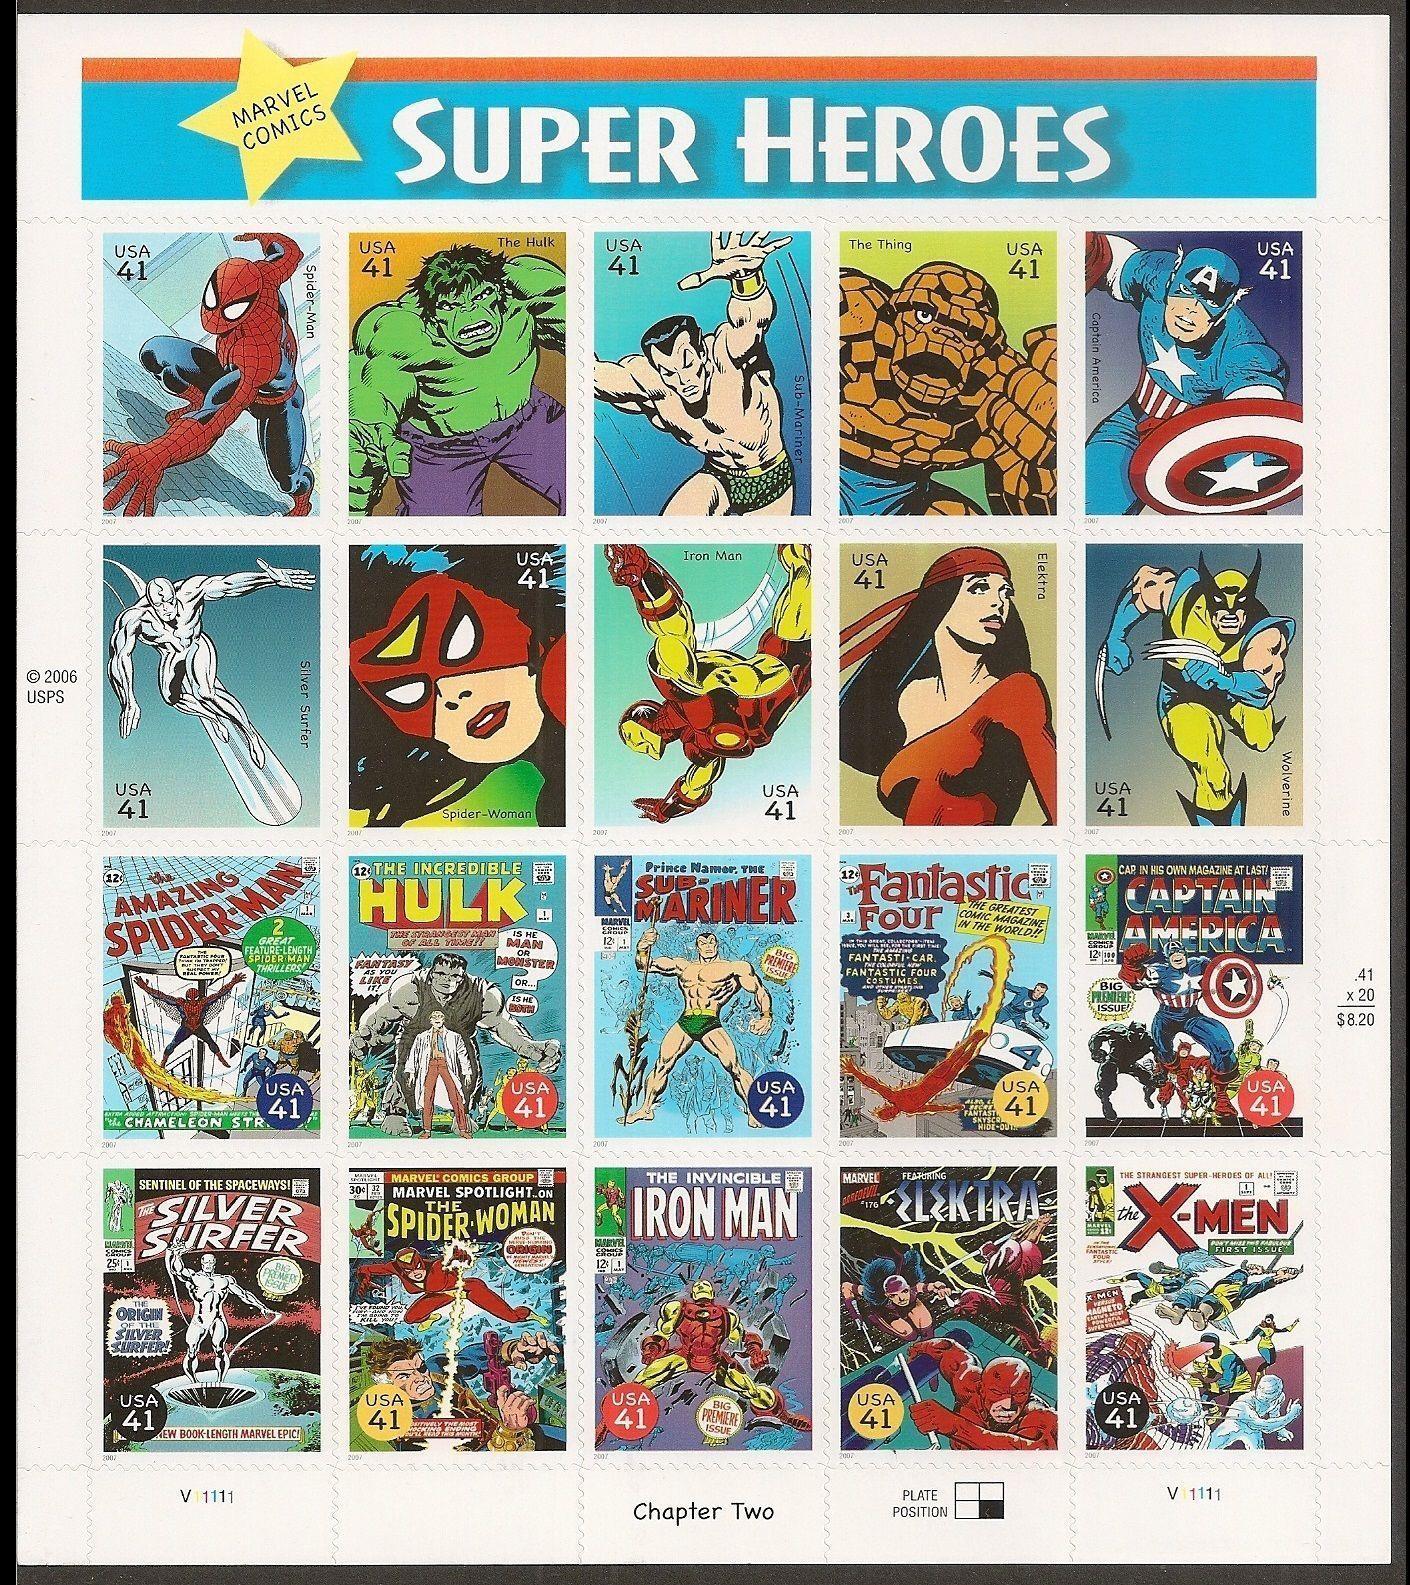 Marvel Comics Super Heroes Sheet of Twenty 41¢ Stamps Scott 4159 - Stuart Katz